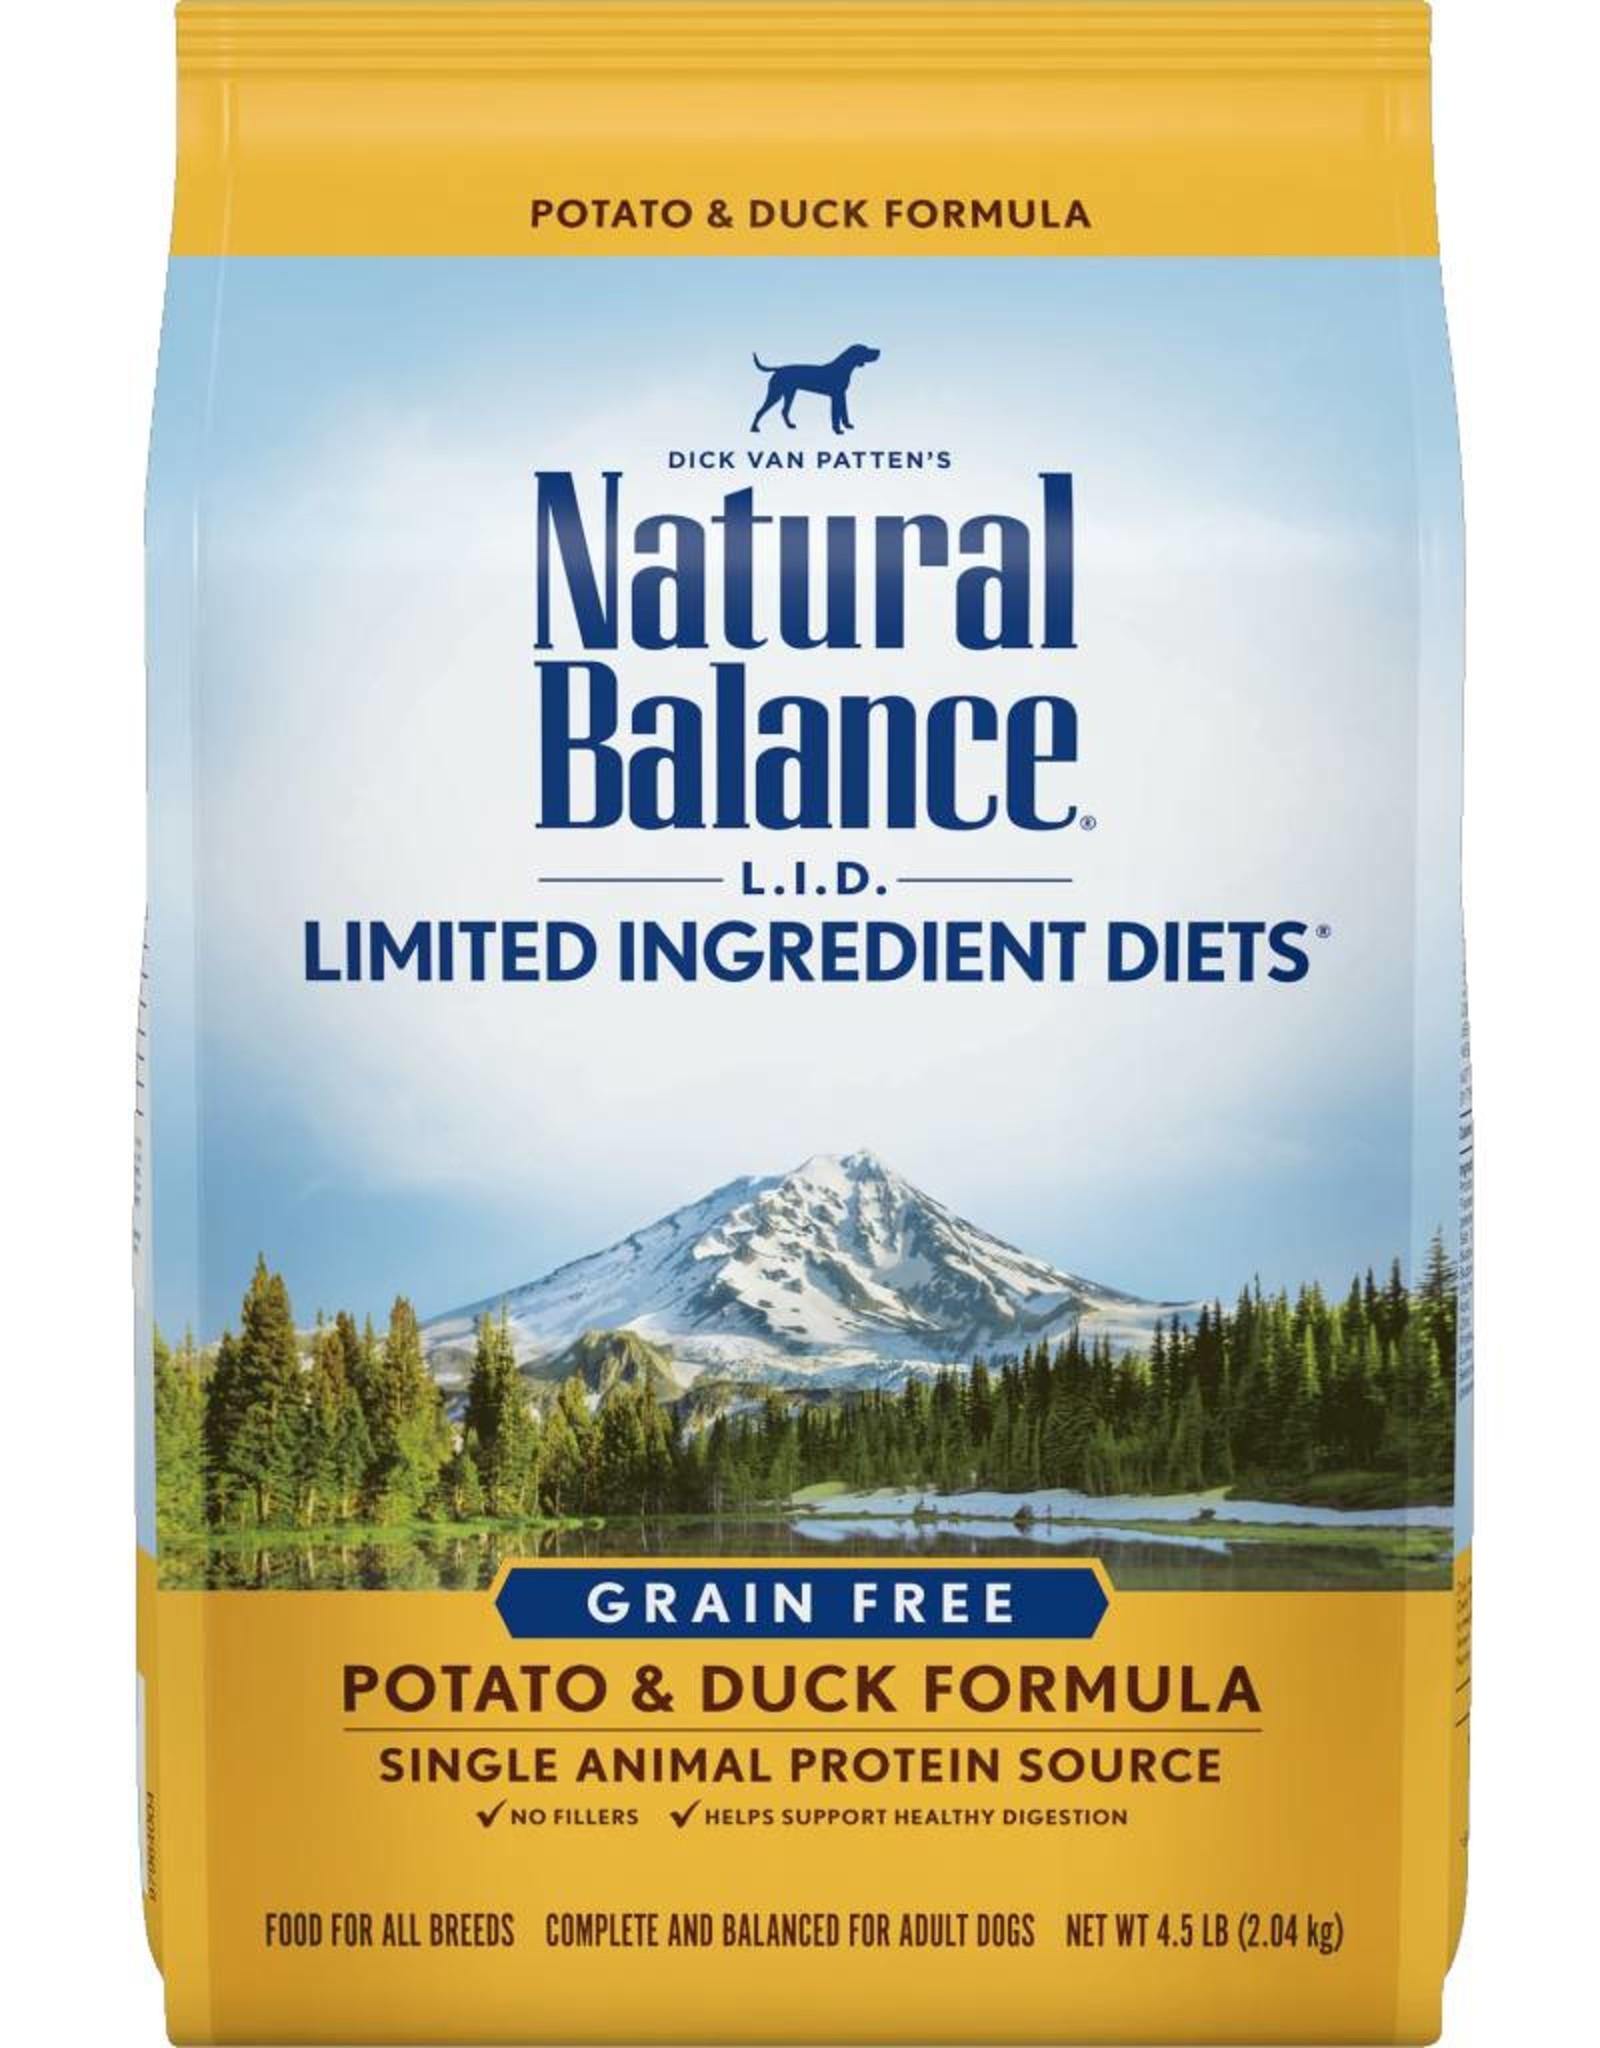 Natural Balance L.I.D. Limited Ingredient Diets Potato & Duck Formula Grain-Free Dry Dog Food